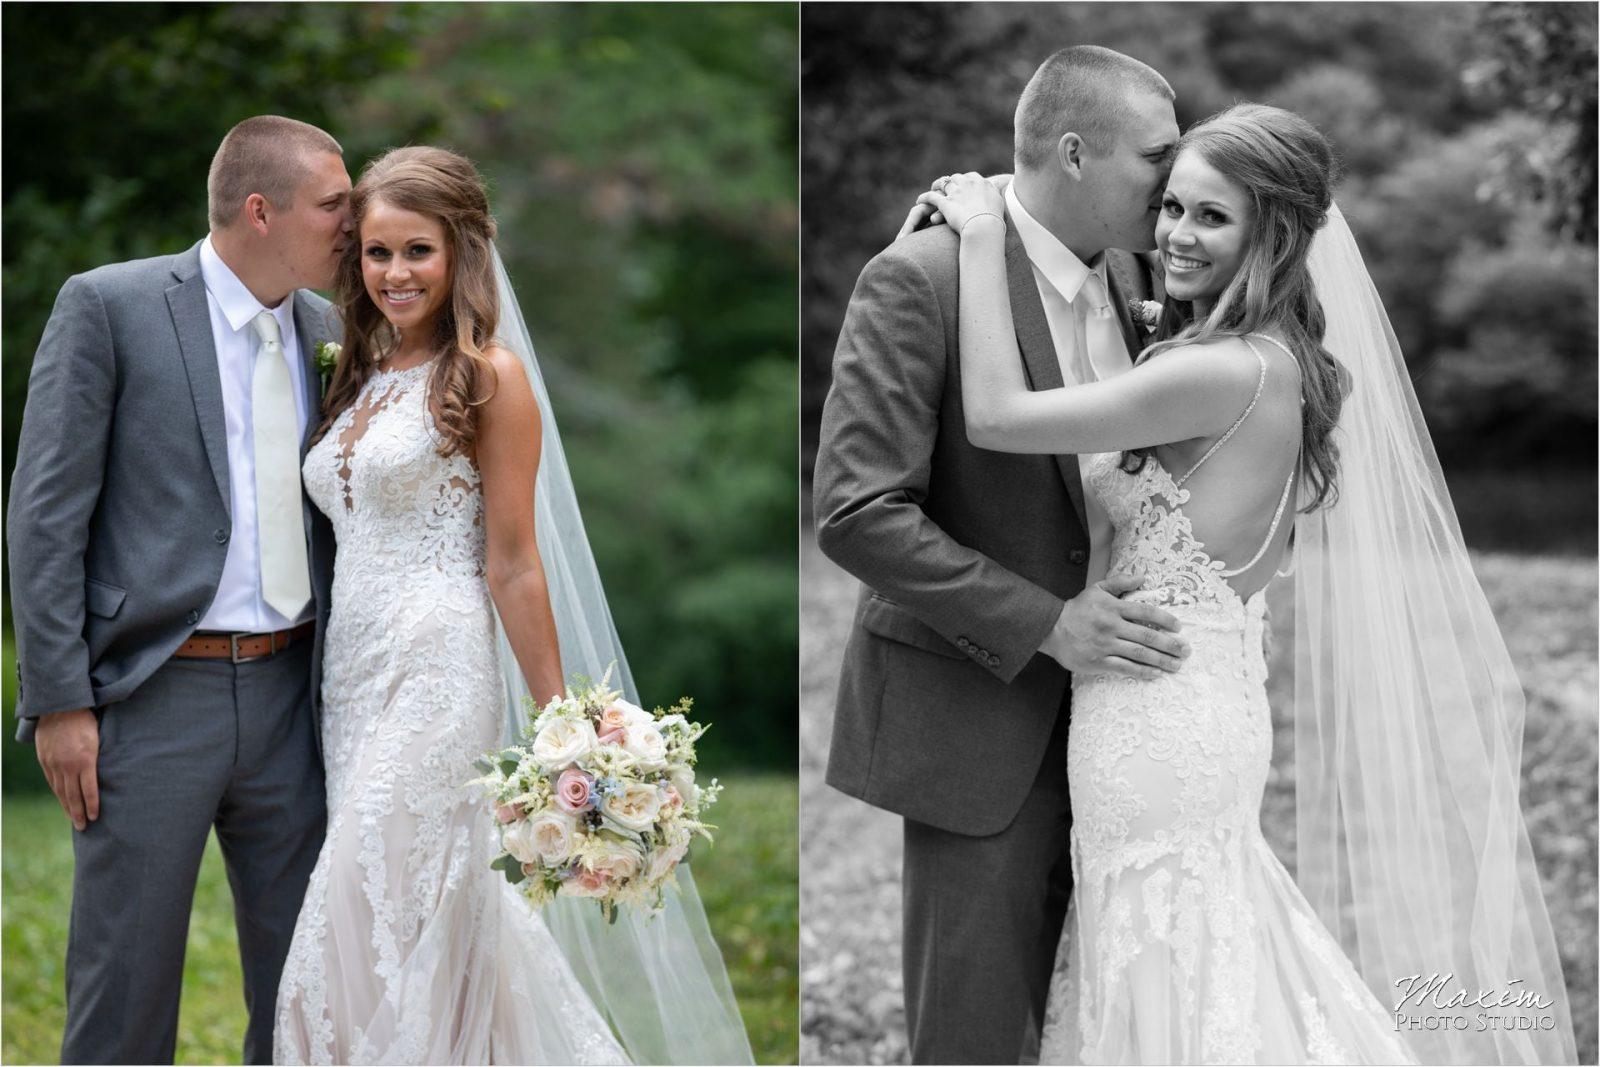 Eden Park Cincinnati Wedding Photography Bride Groom